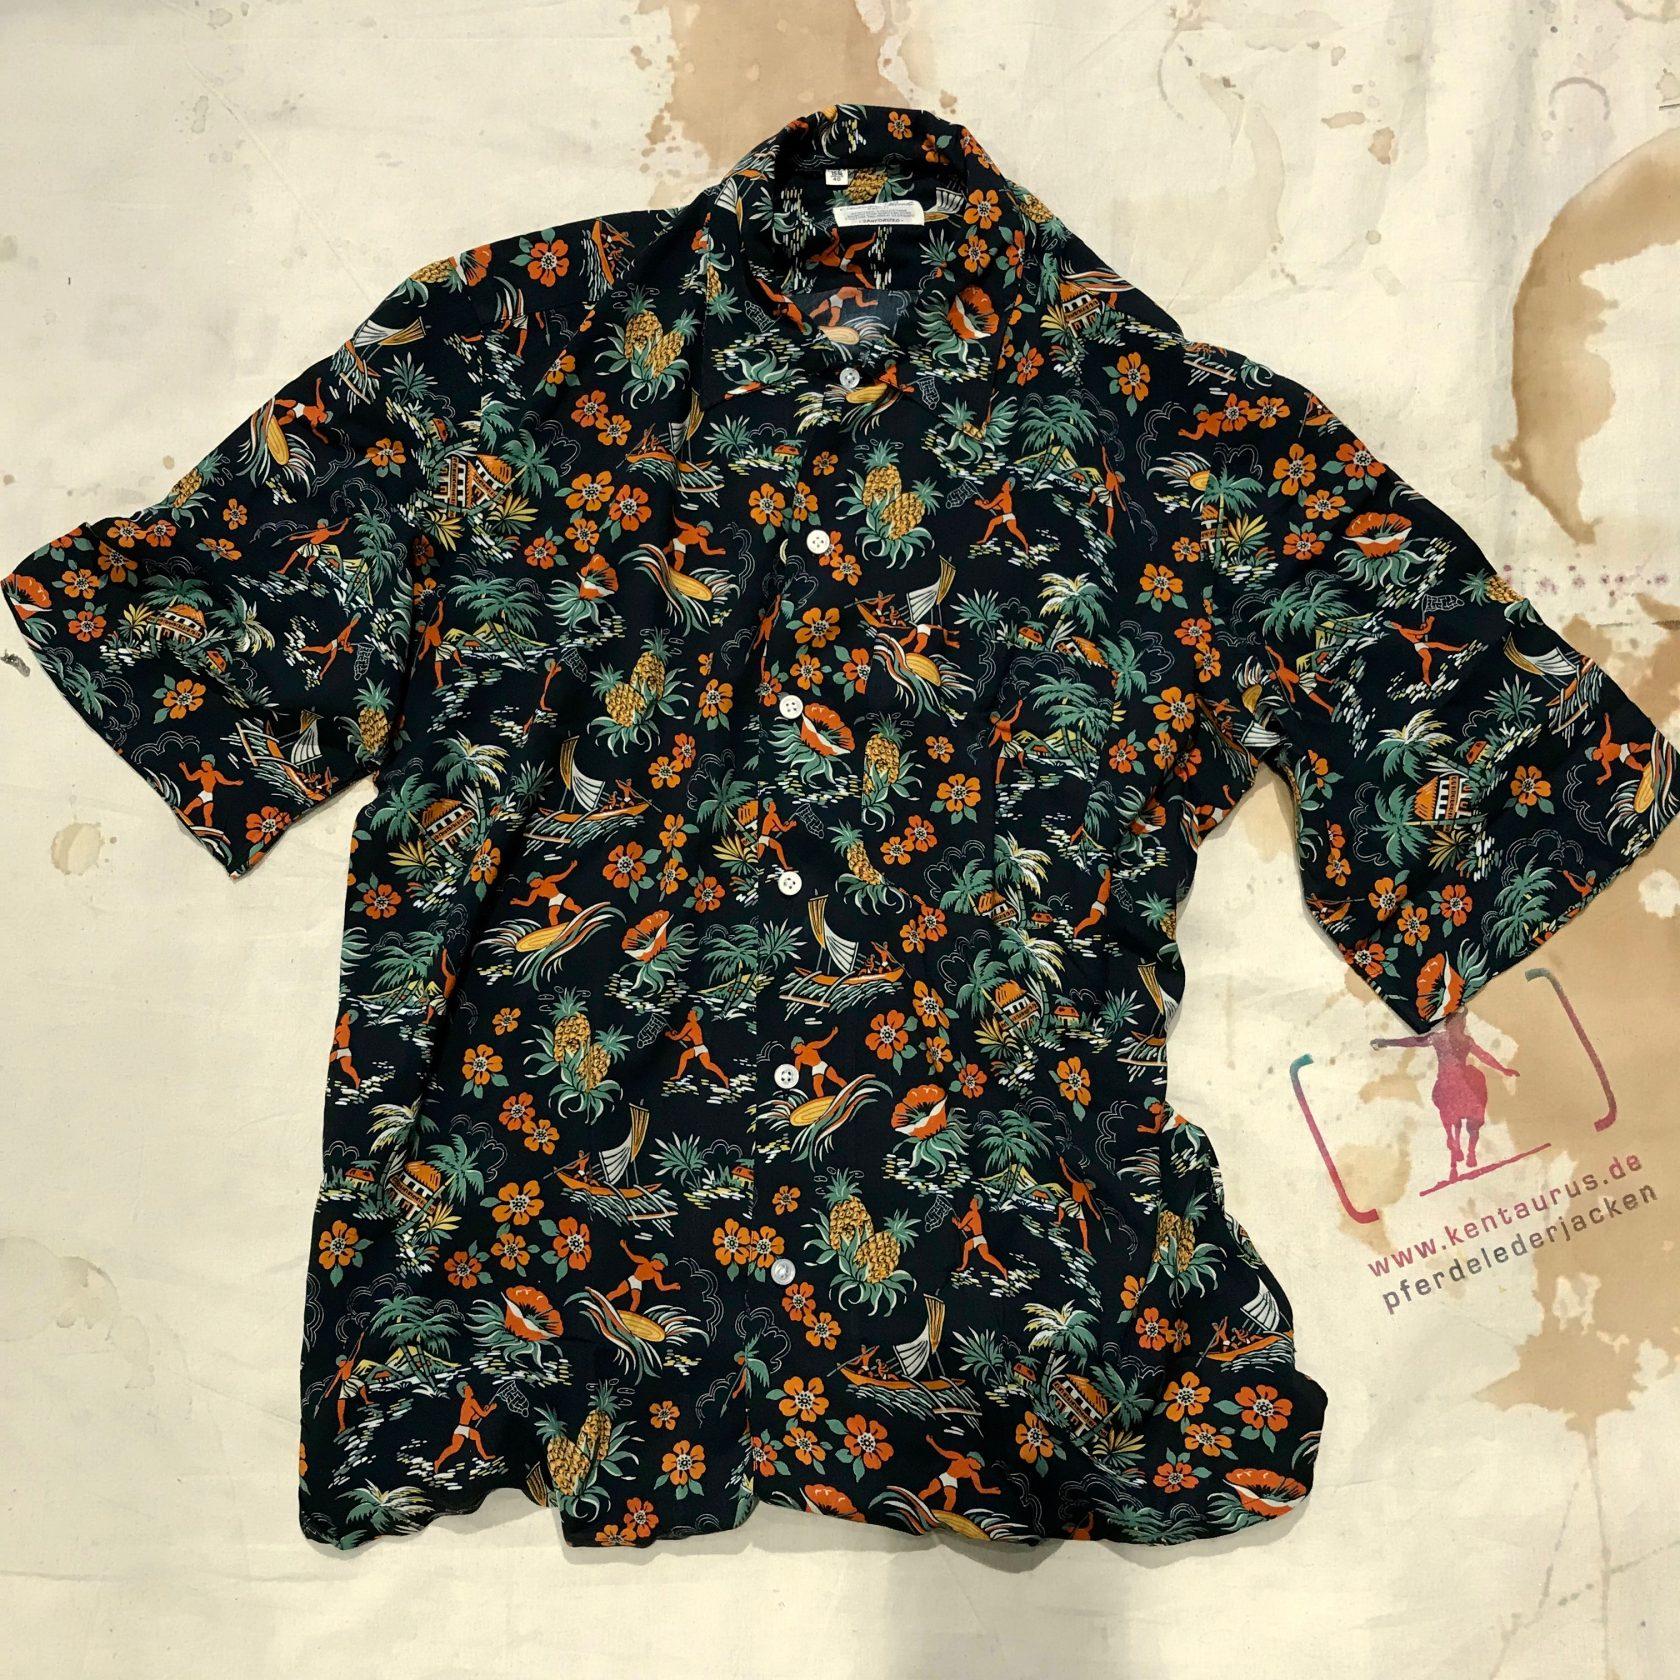 S.Piccolo Hawaii shirt